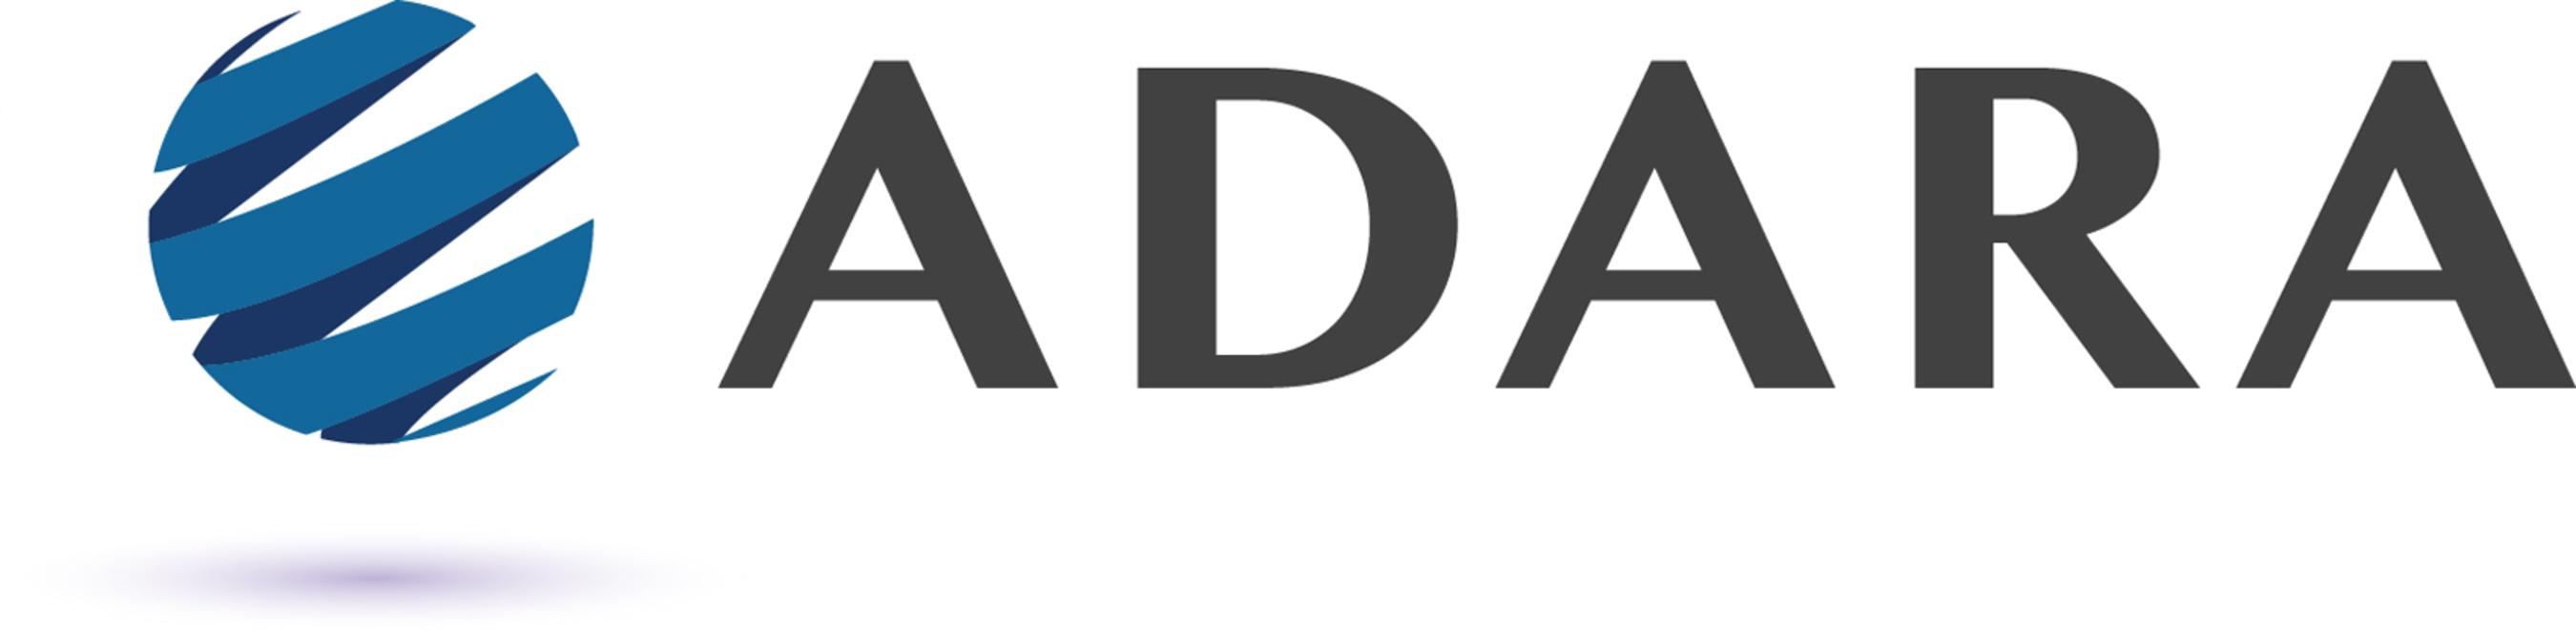 ADARA Networks logo.